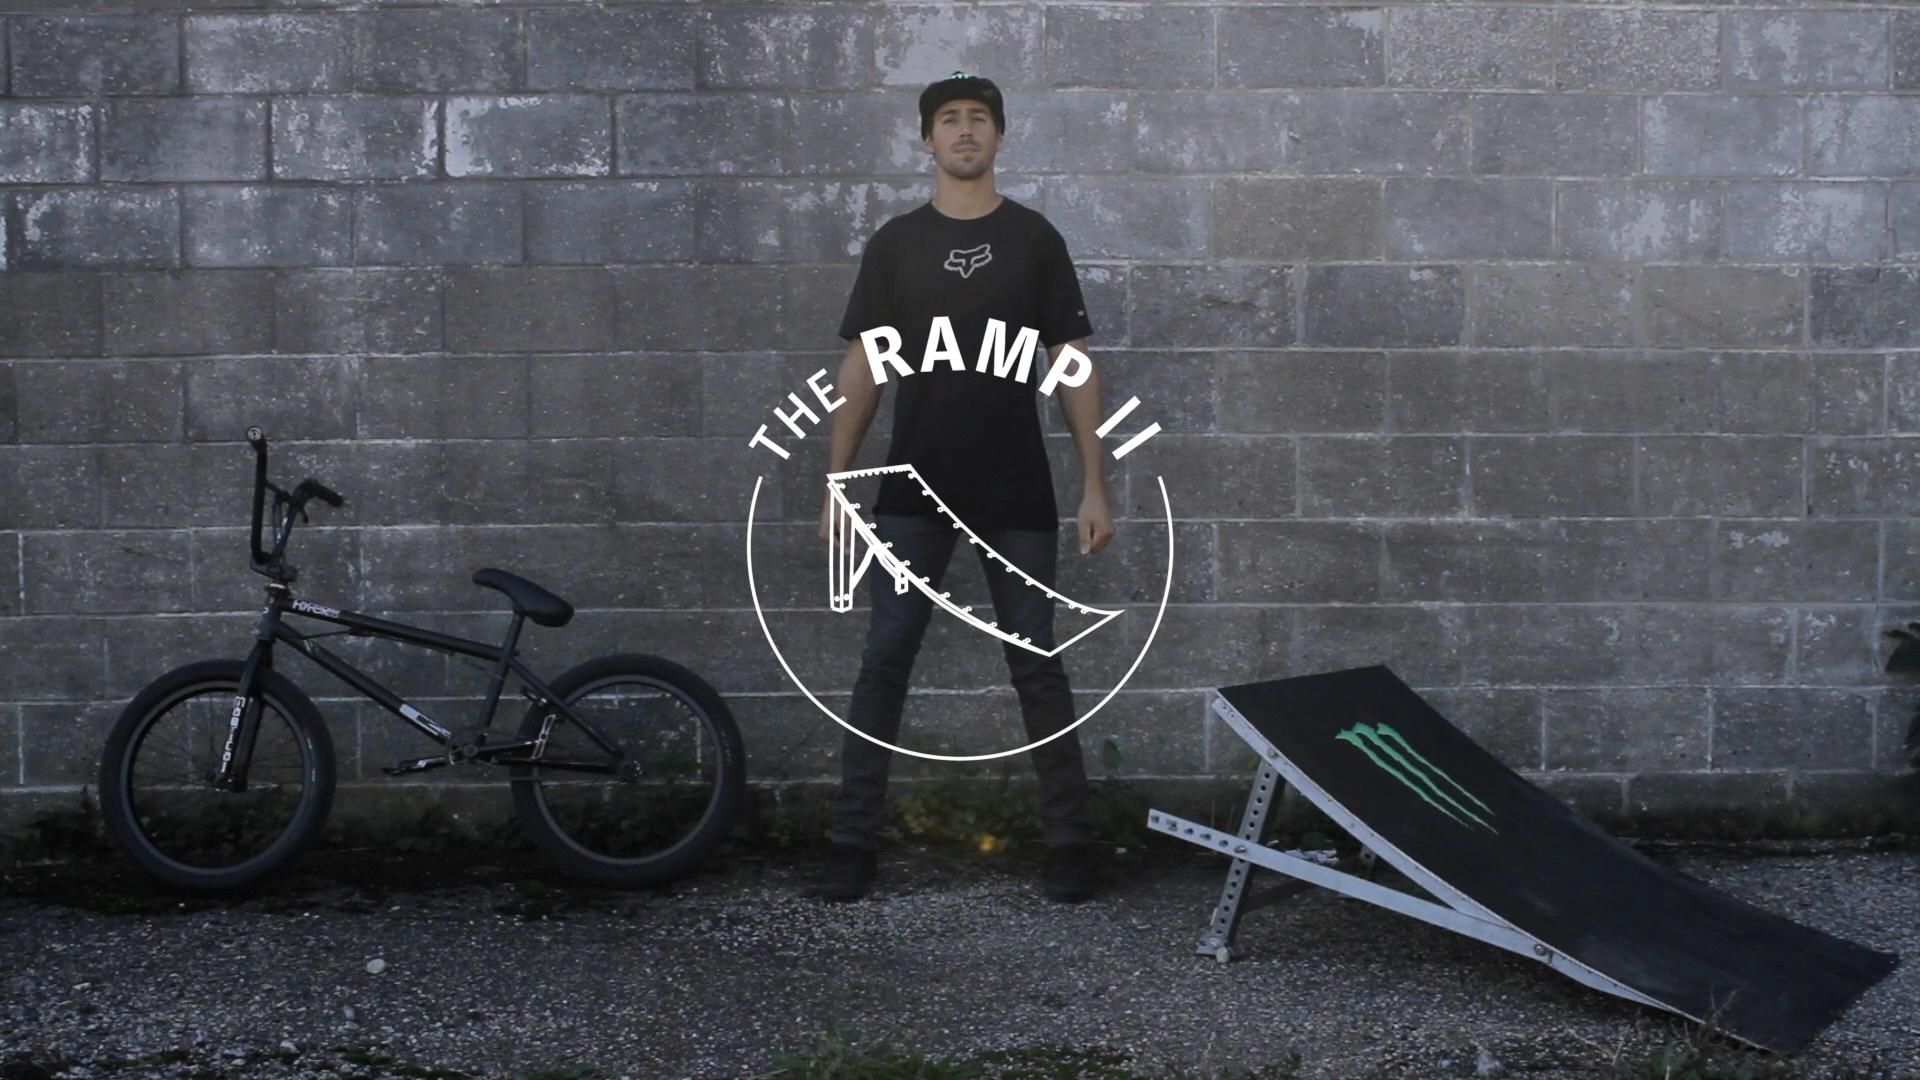 The ramp ii scotty cranmer espn video